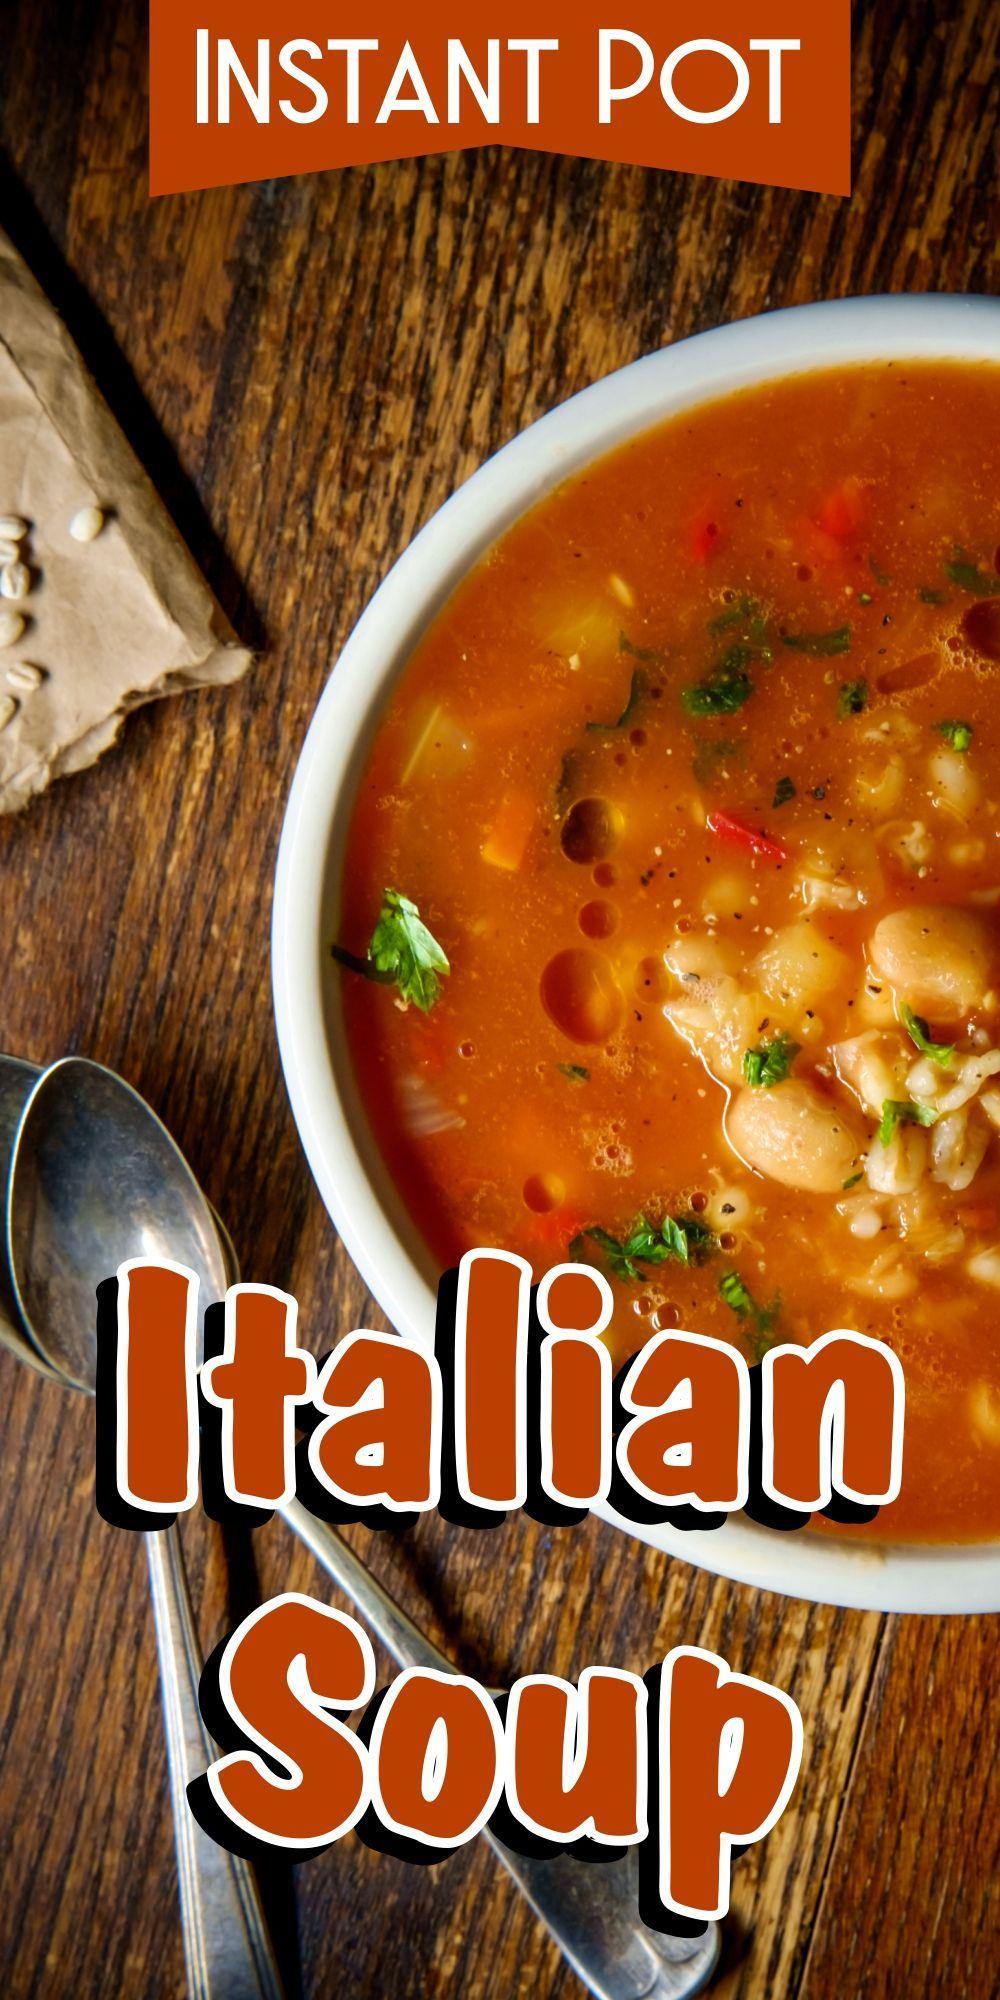 Instant pot italian soup recipe best pressure cooker